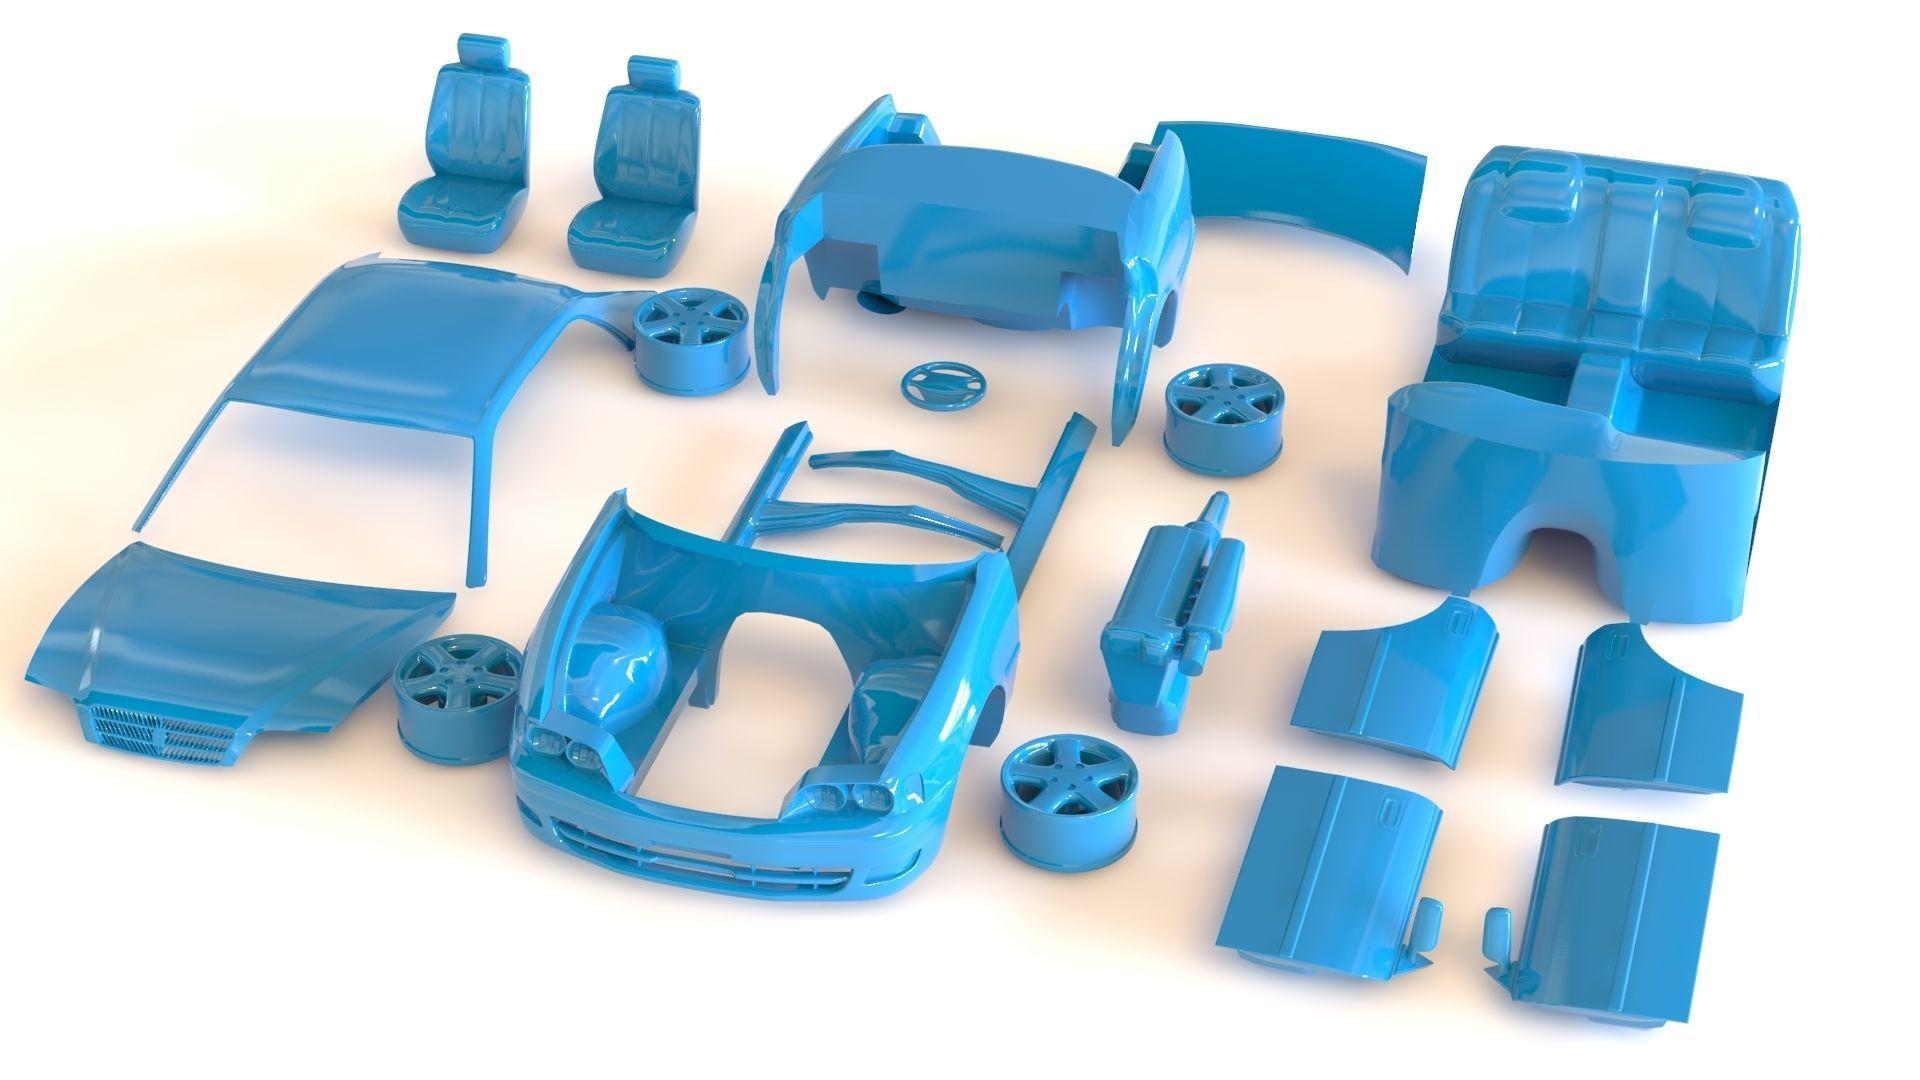 Toyota Chaser JZX100 blueprint kit